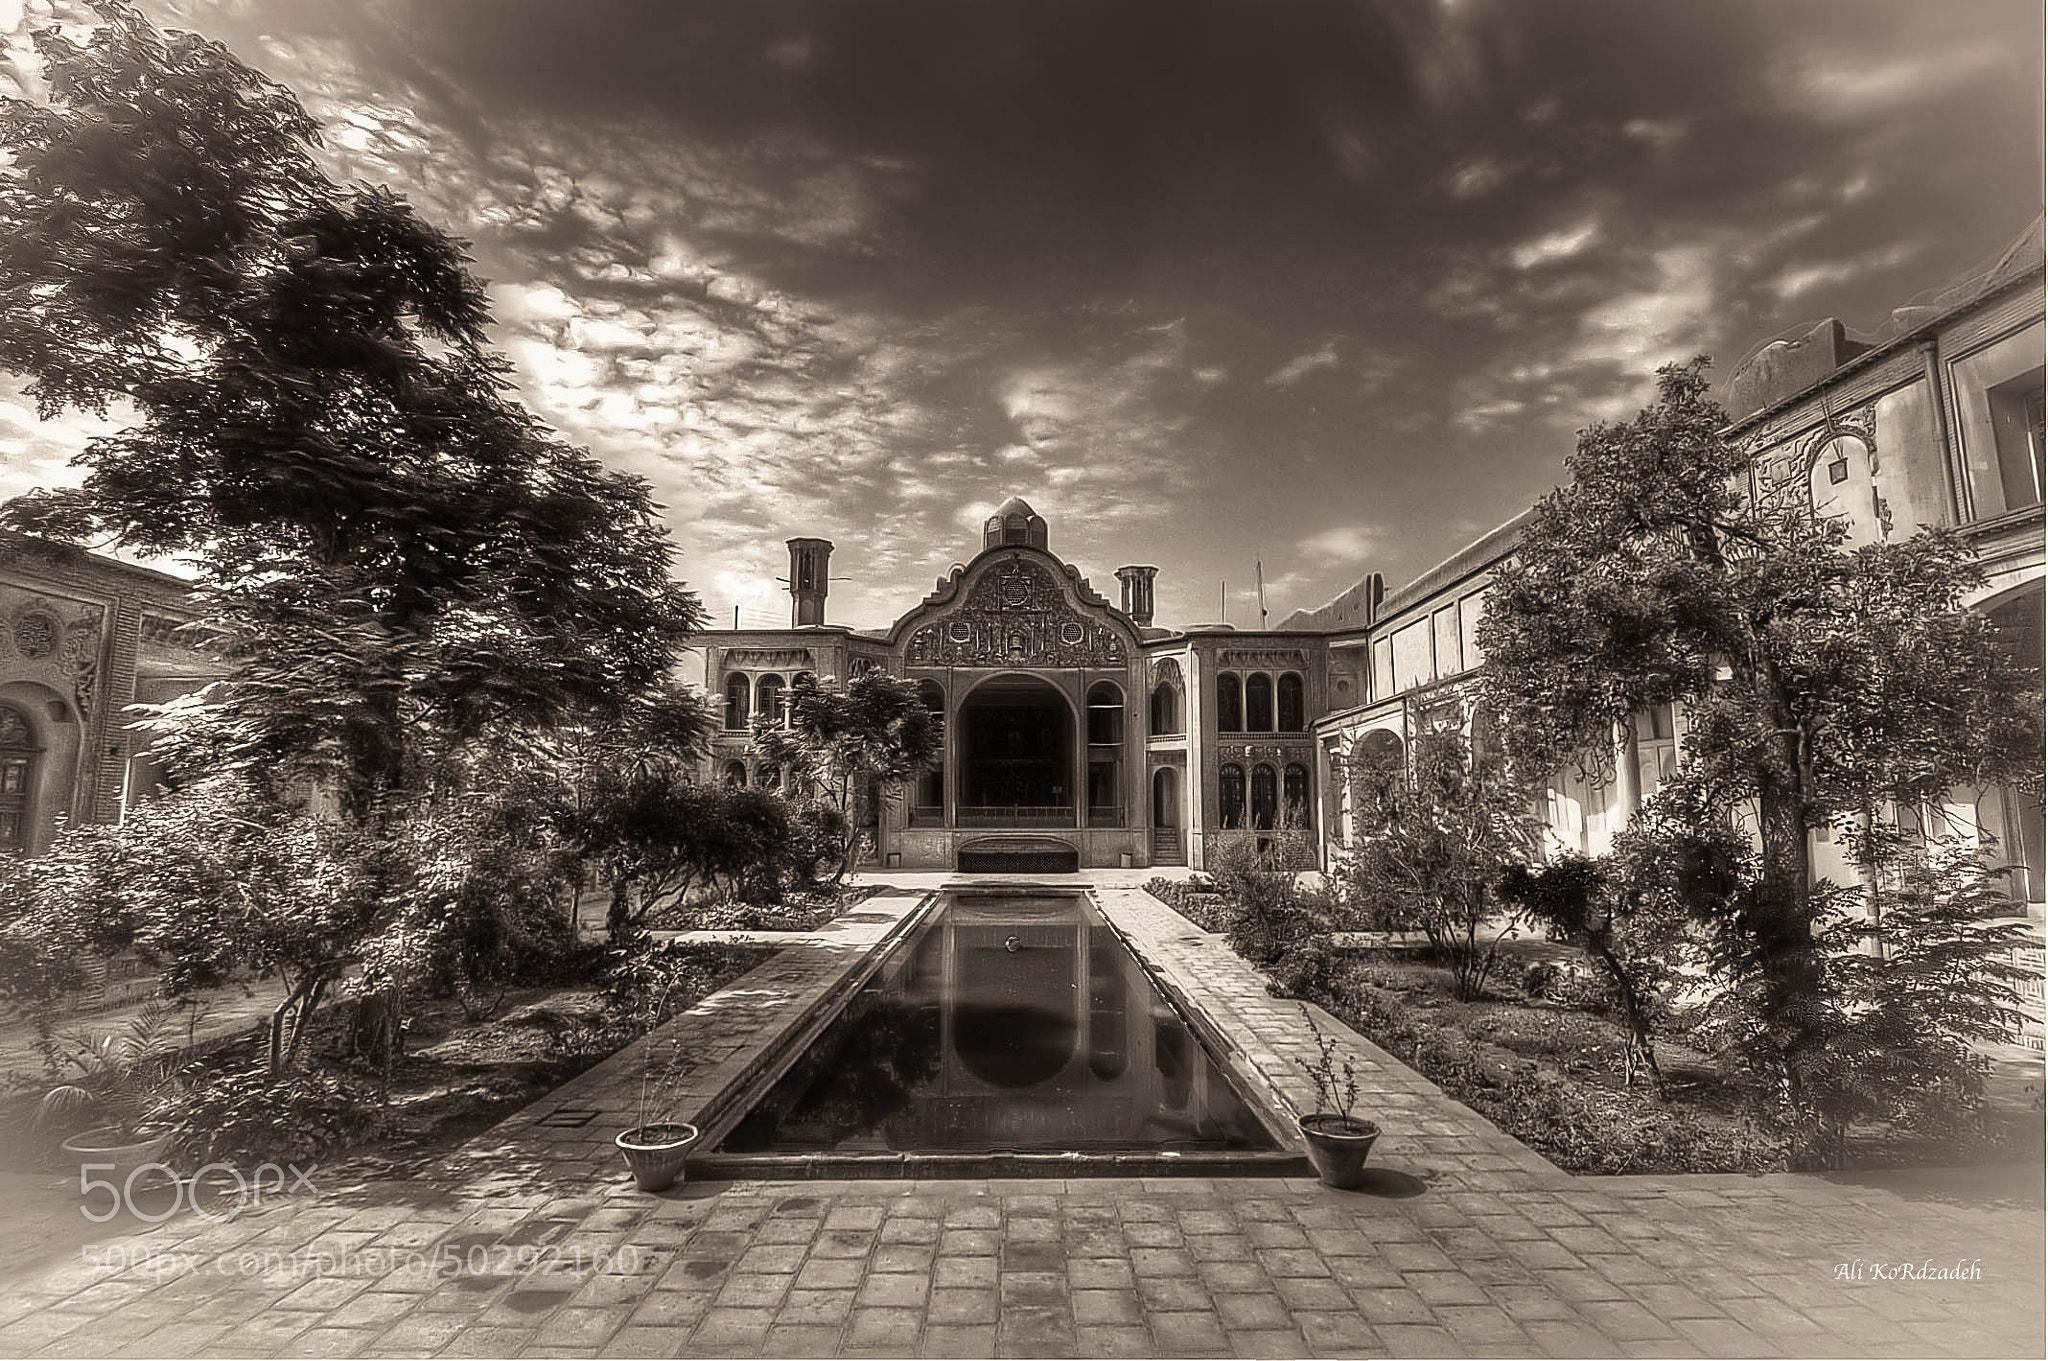 Photograph Boroujerdi House by Ali KoRdZaDeh on 500px